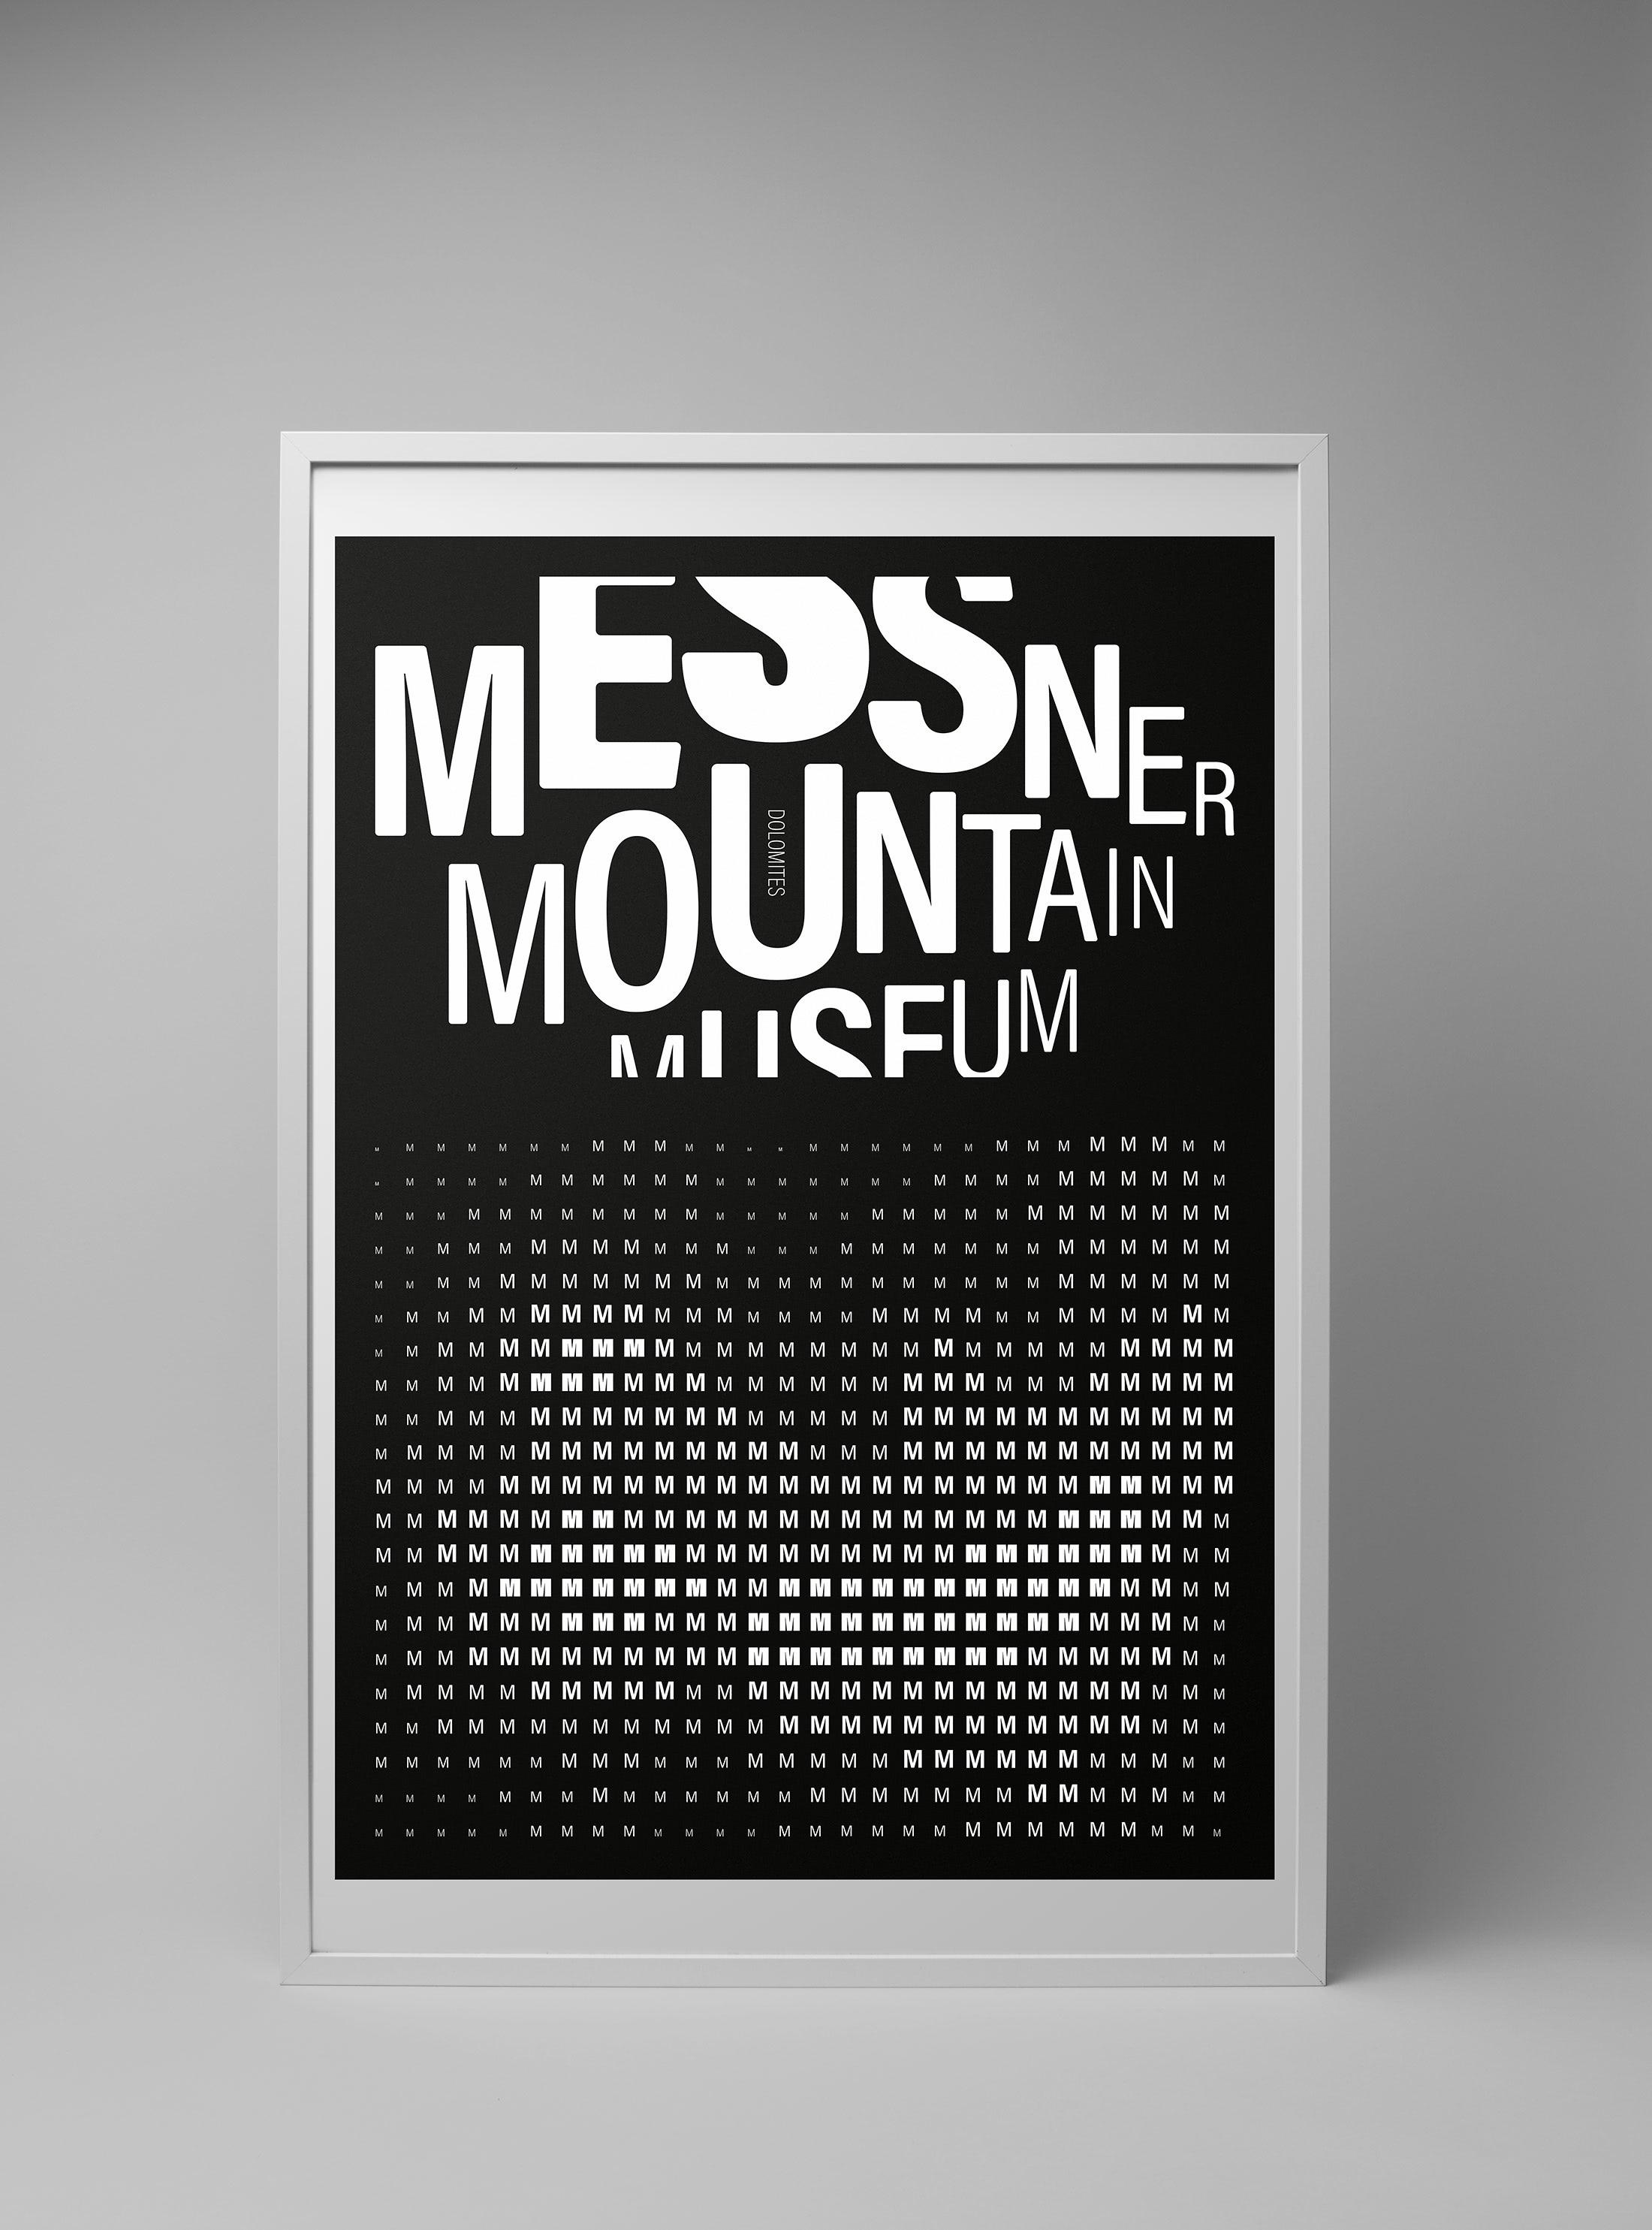 Messner_Mountain_Museum_15-Mitja_Schneehage